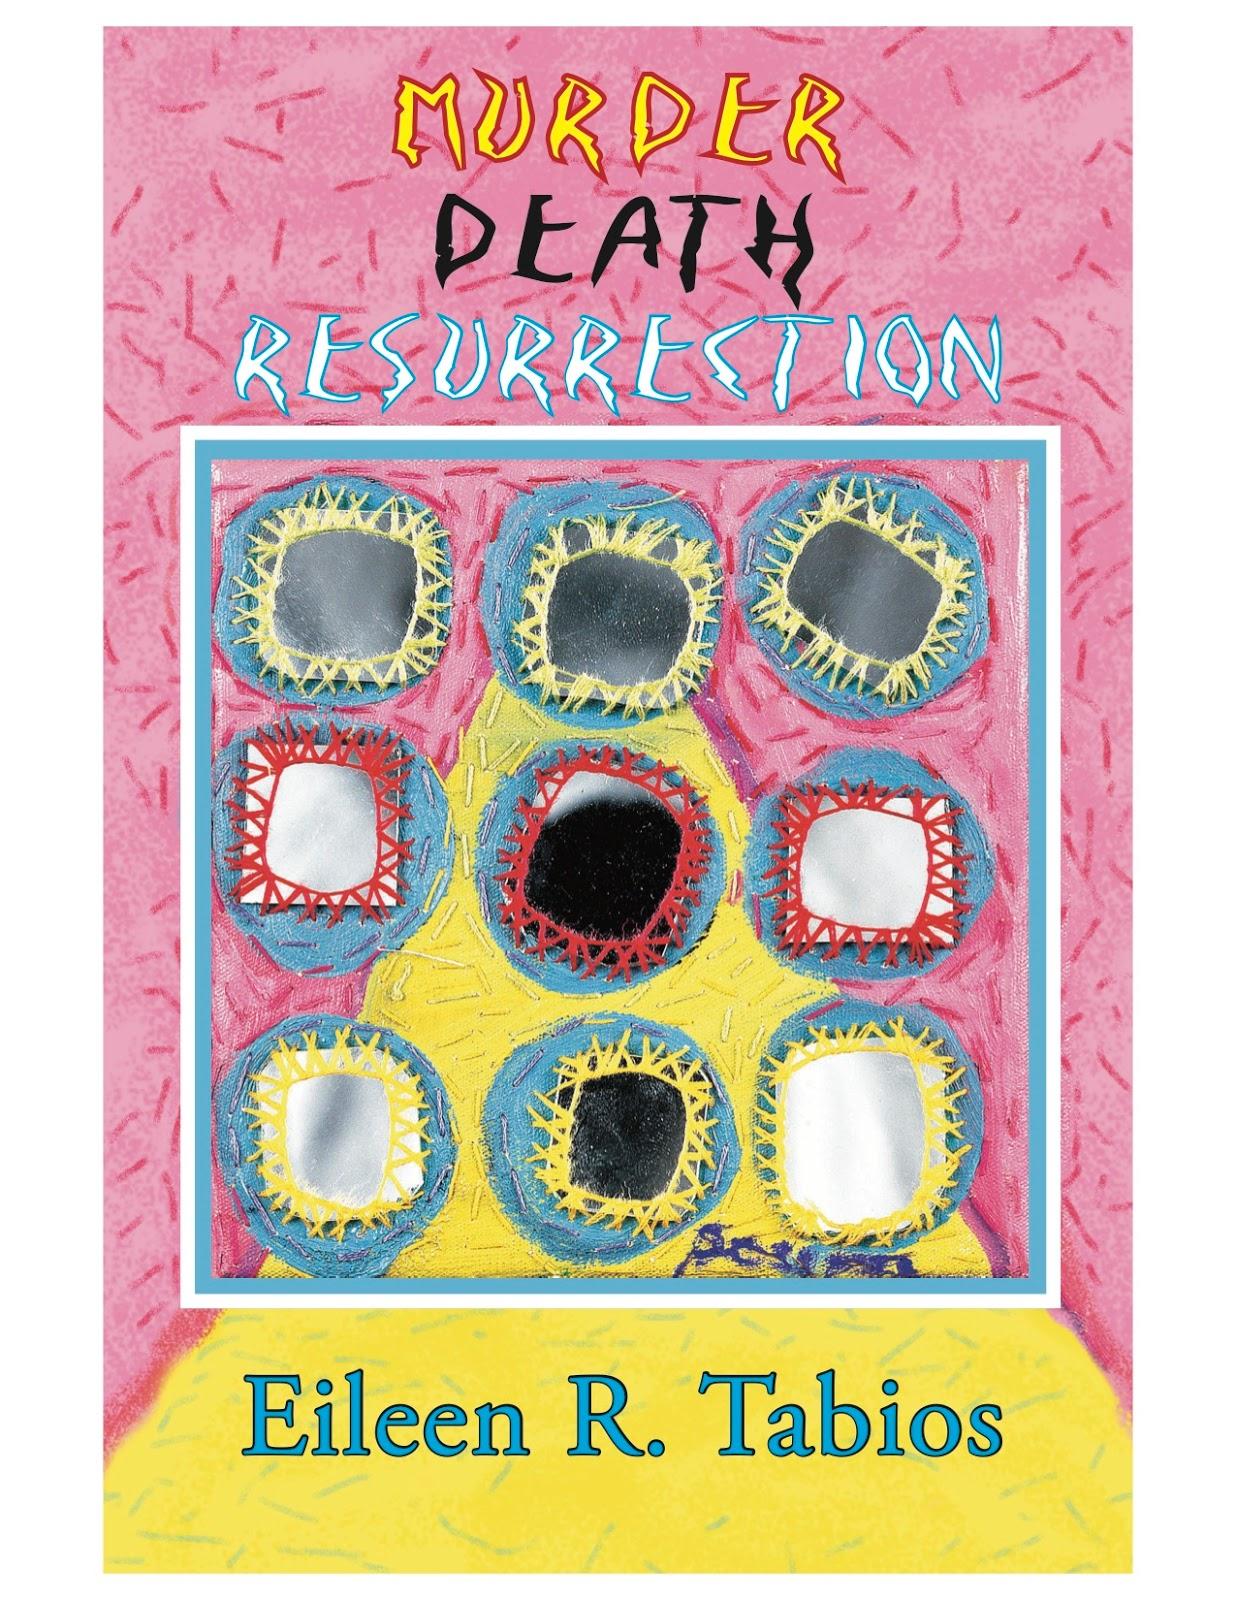 Eileen Verbs Books